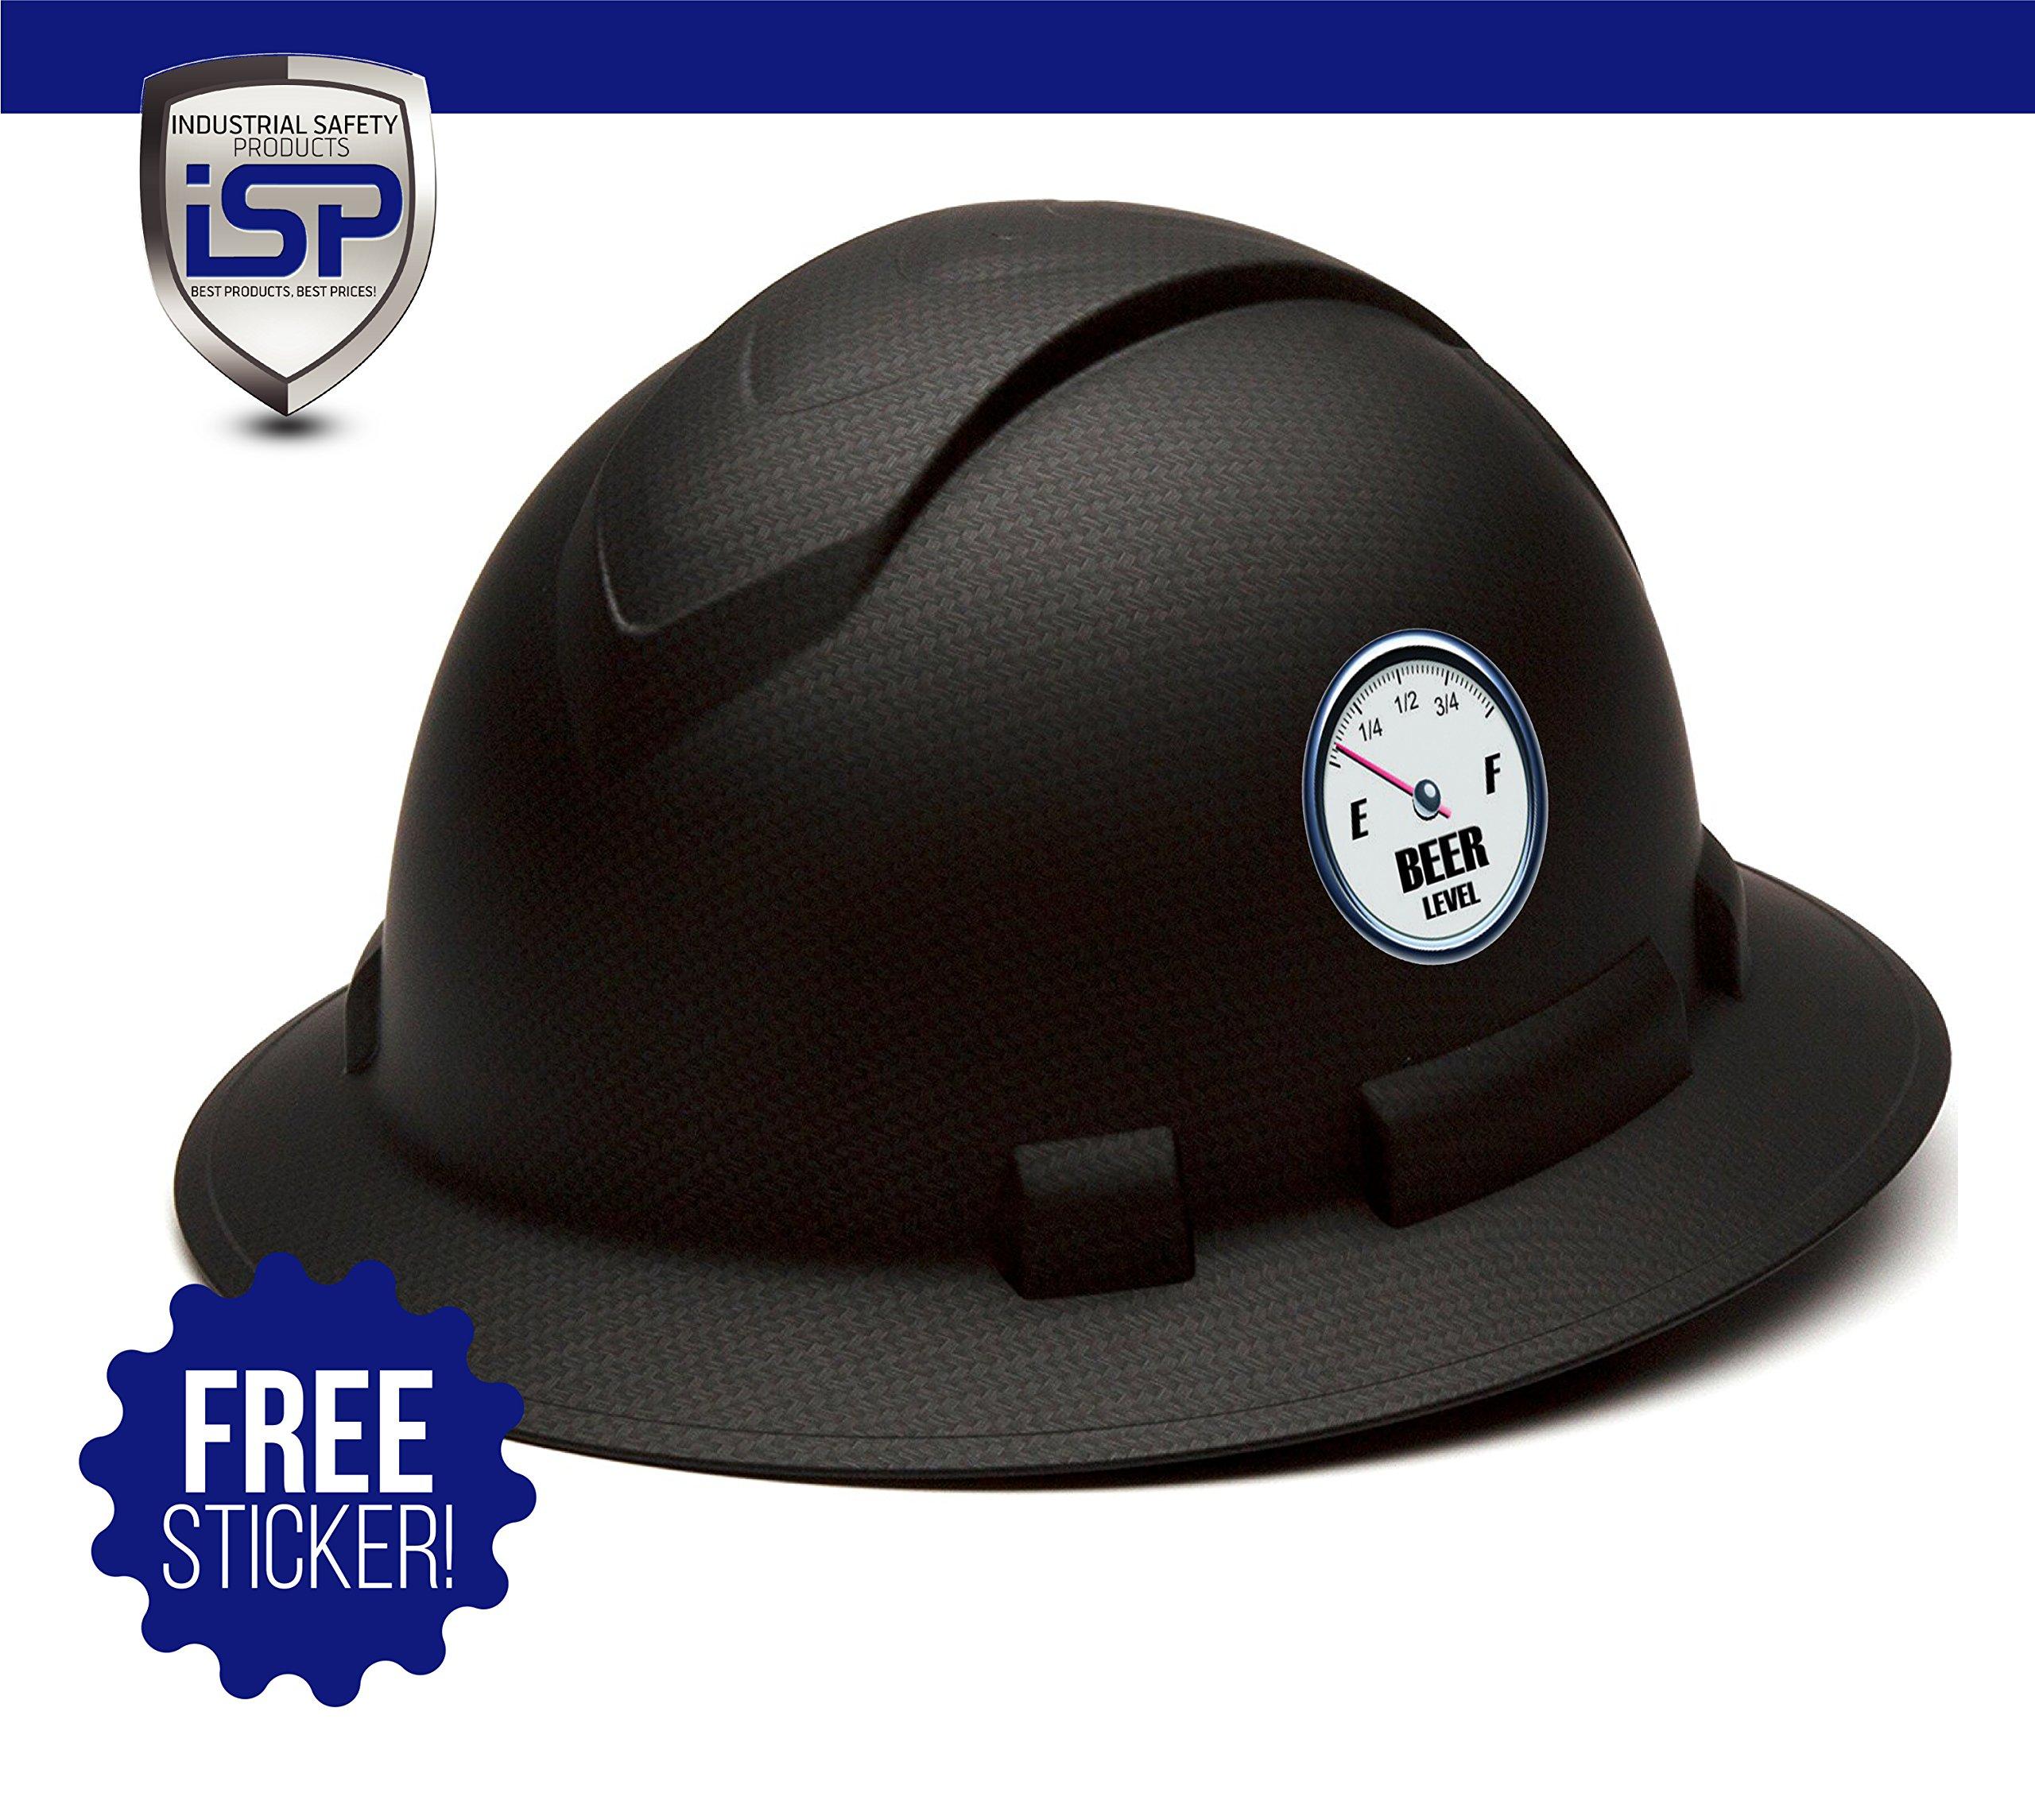 Pyramex Full Brim RIDGELINE Patterned Hard Hat with 6 Point Ratchet Suspension - Gray Graphite